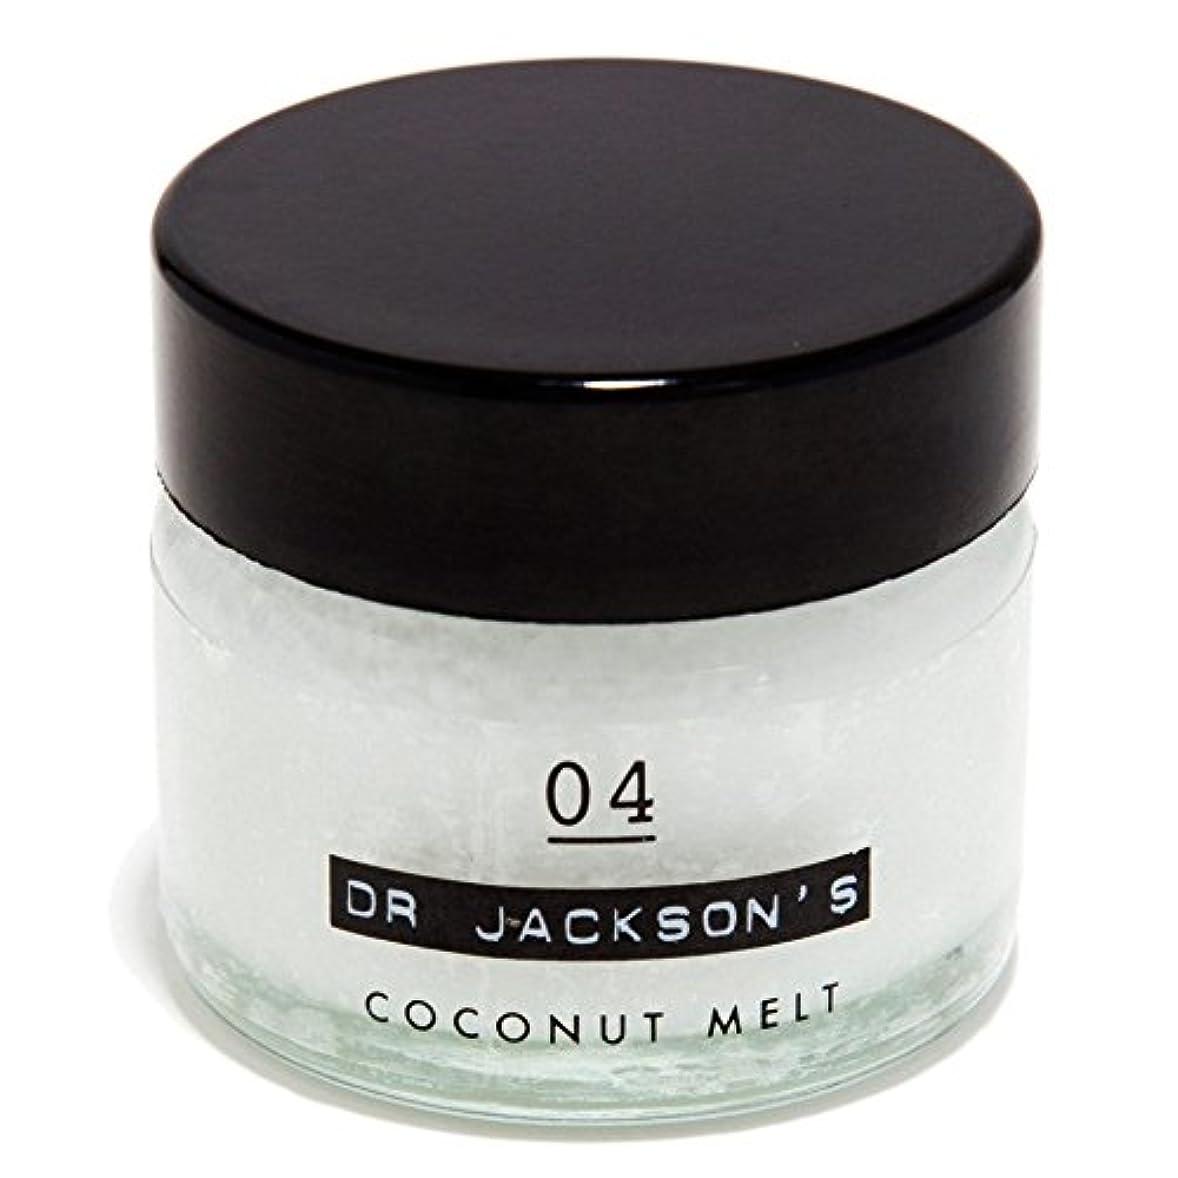 Dr Jackson's 04 Coconut Melt 15ml - ジャクソンの04ココナッツメルト15ミリリットル [並行輸入品]